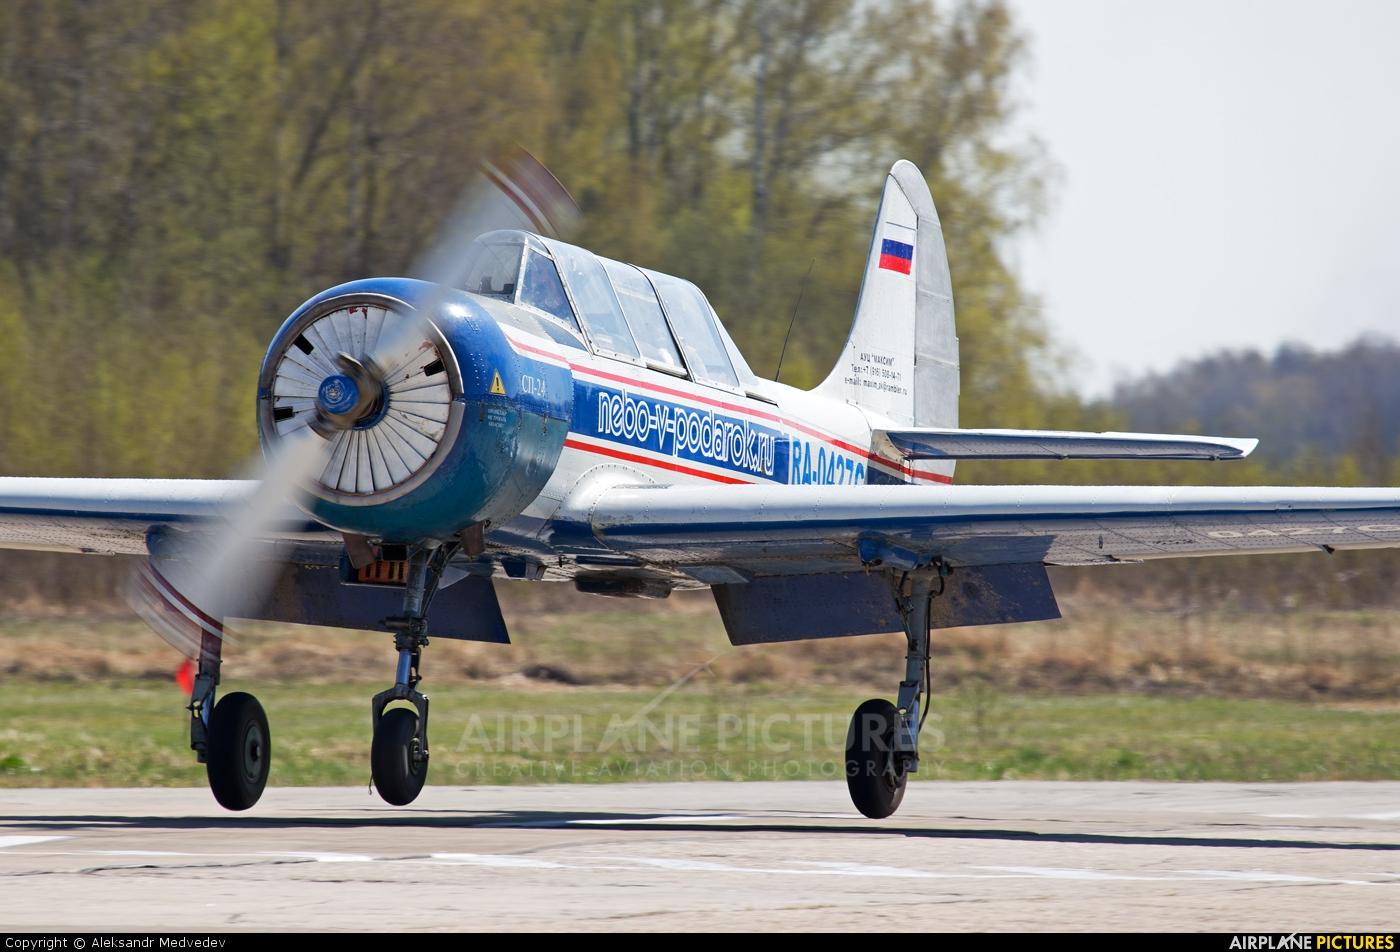 Private RA-0427G aircraft at Bolshoye Gryzlovo